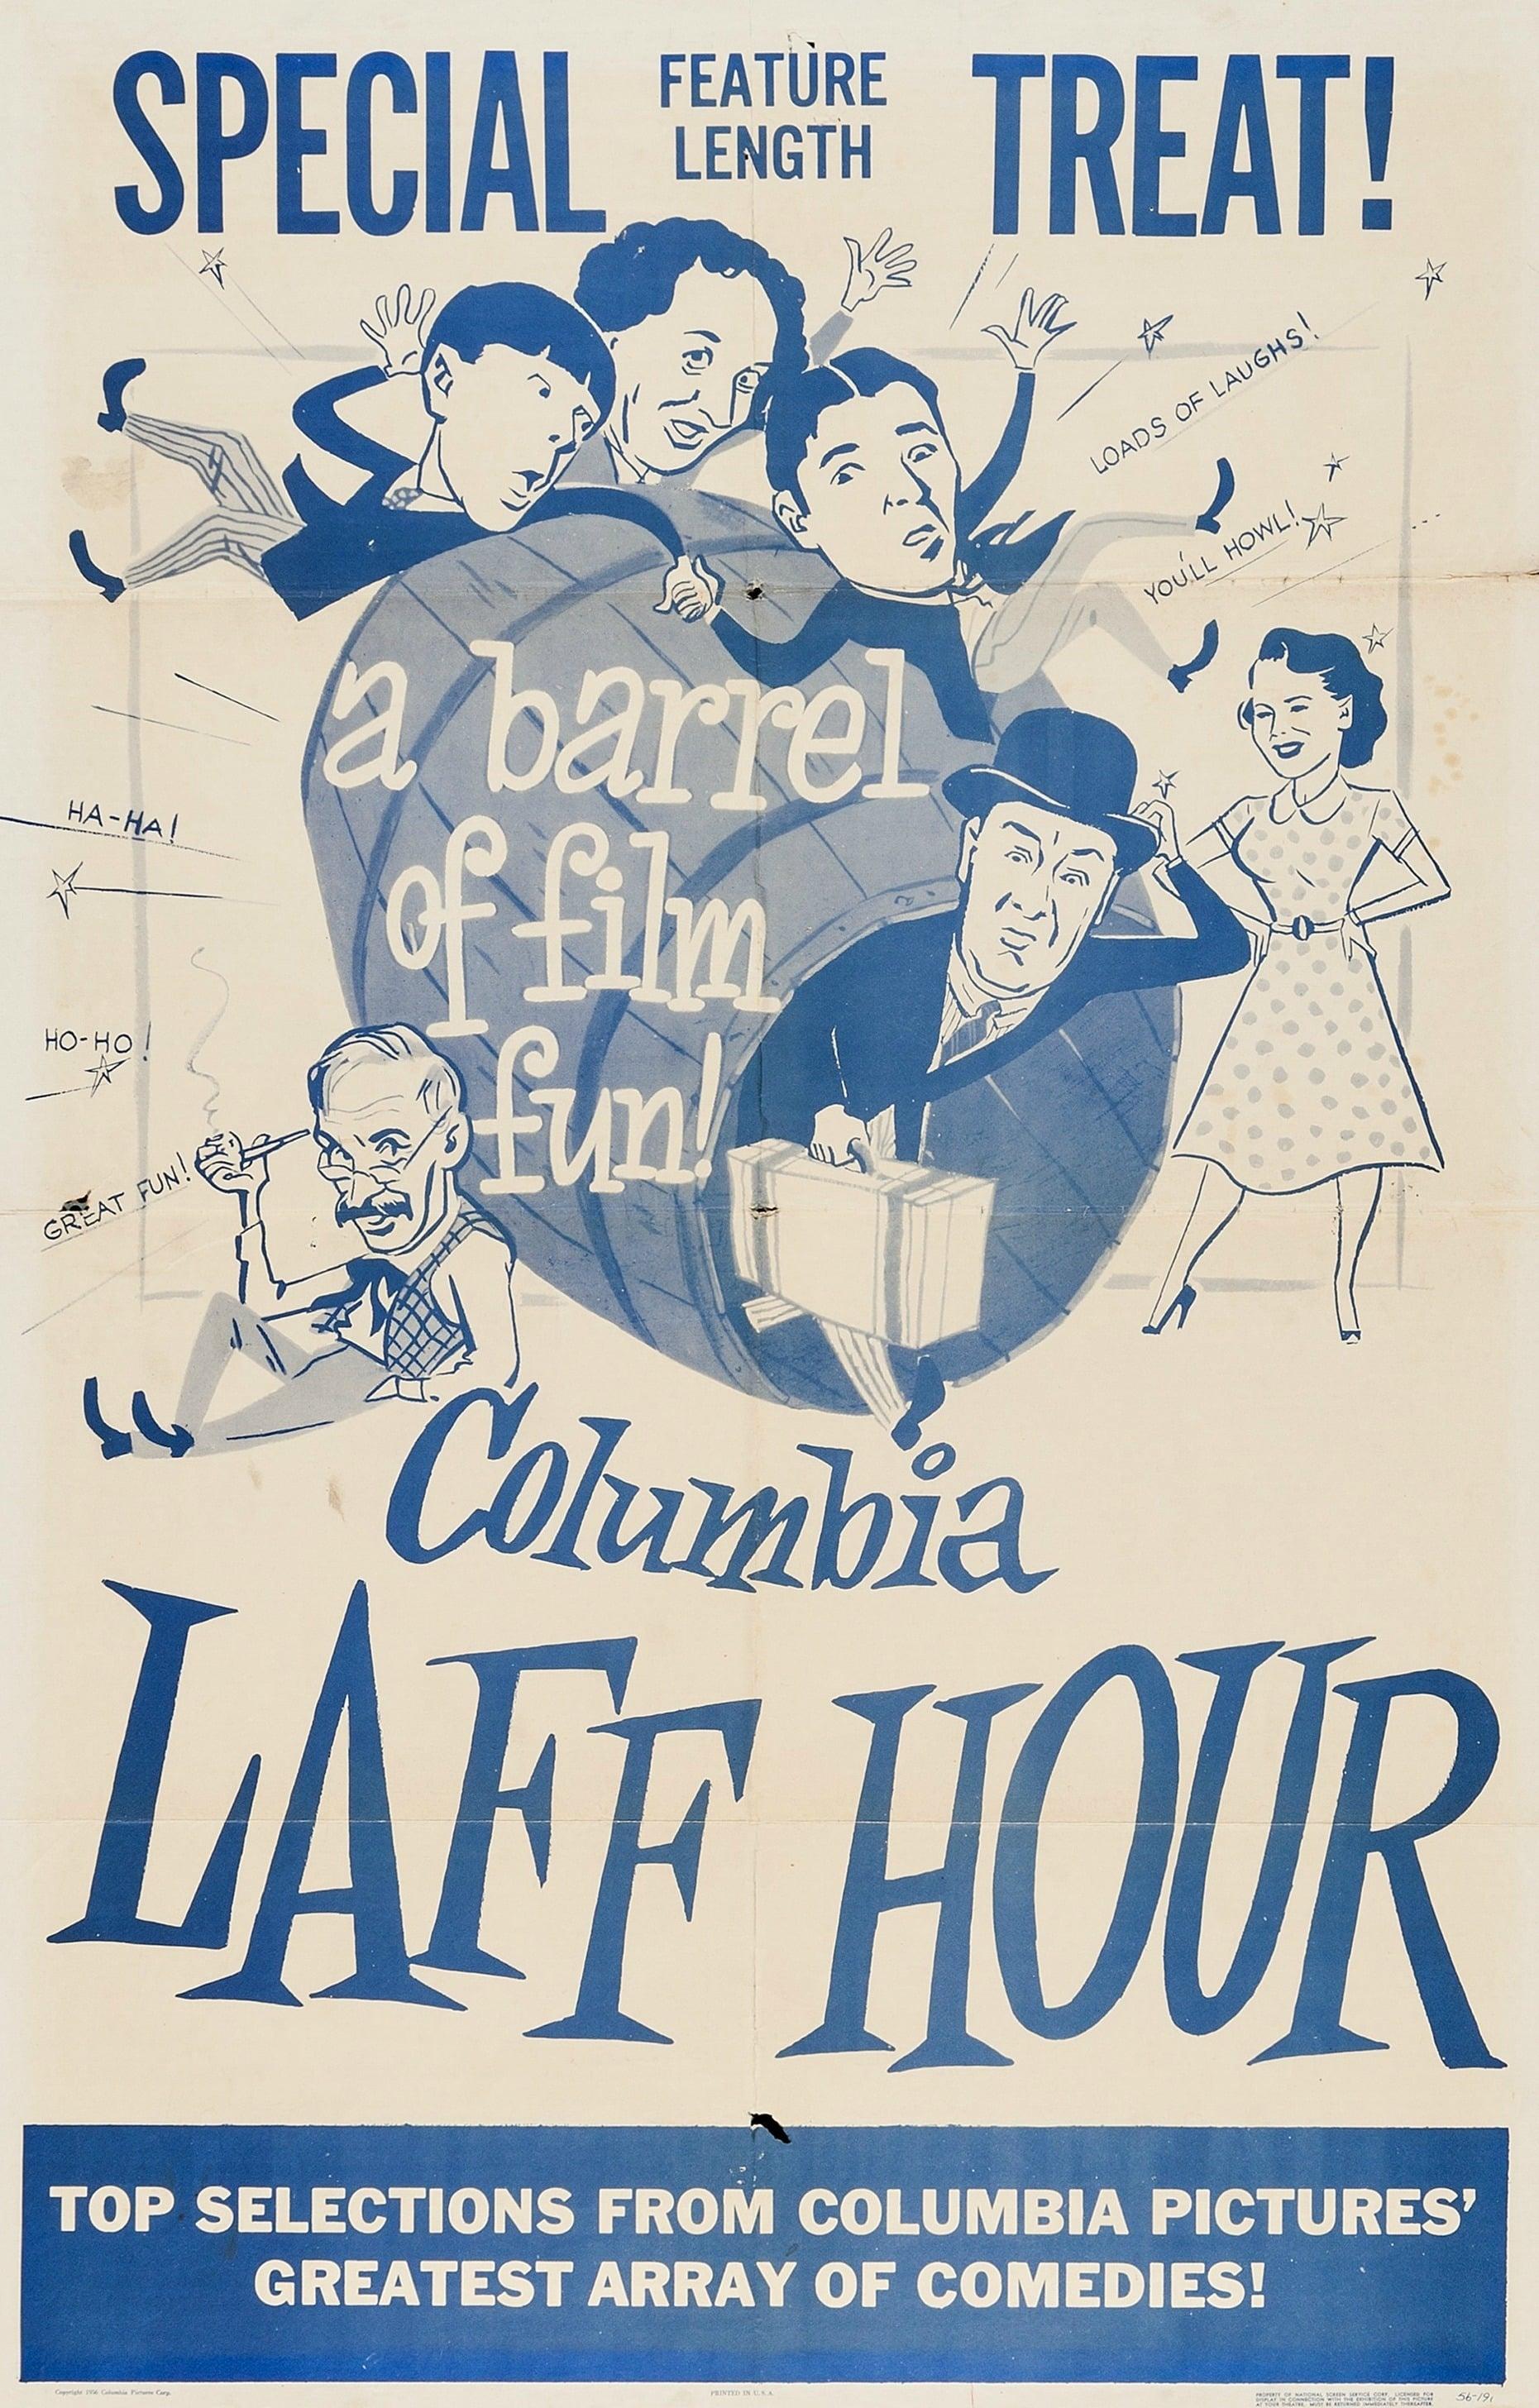 Columbia Laff Hour